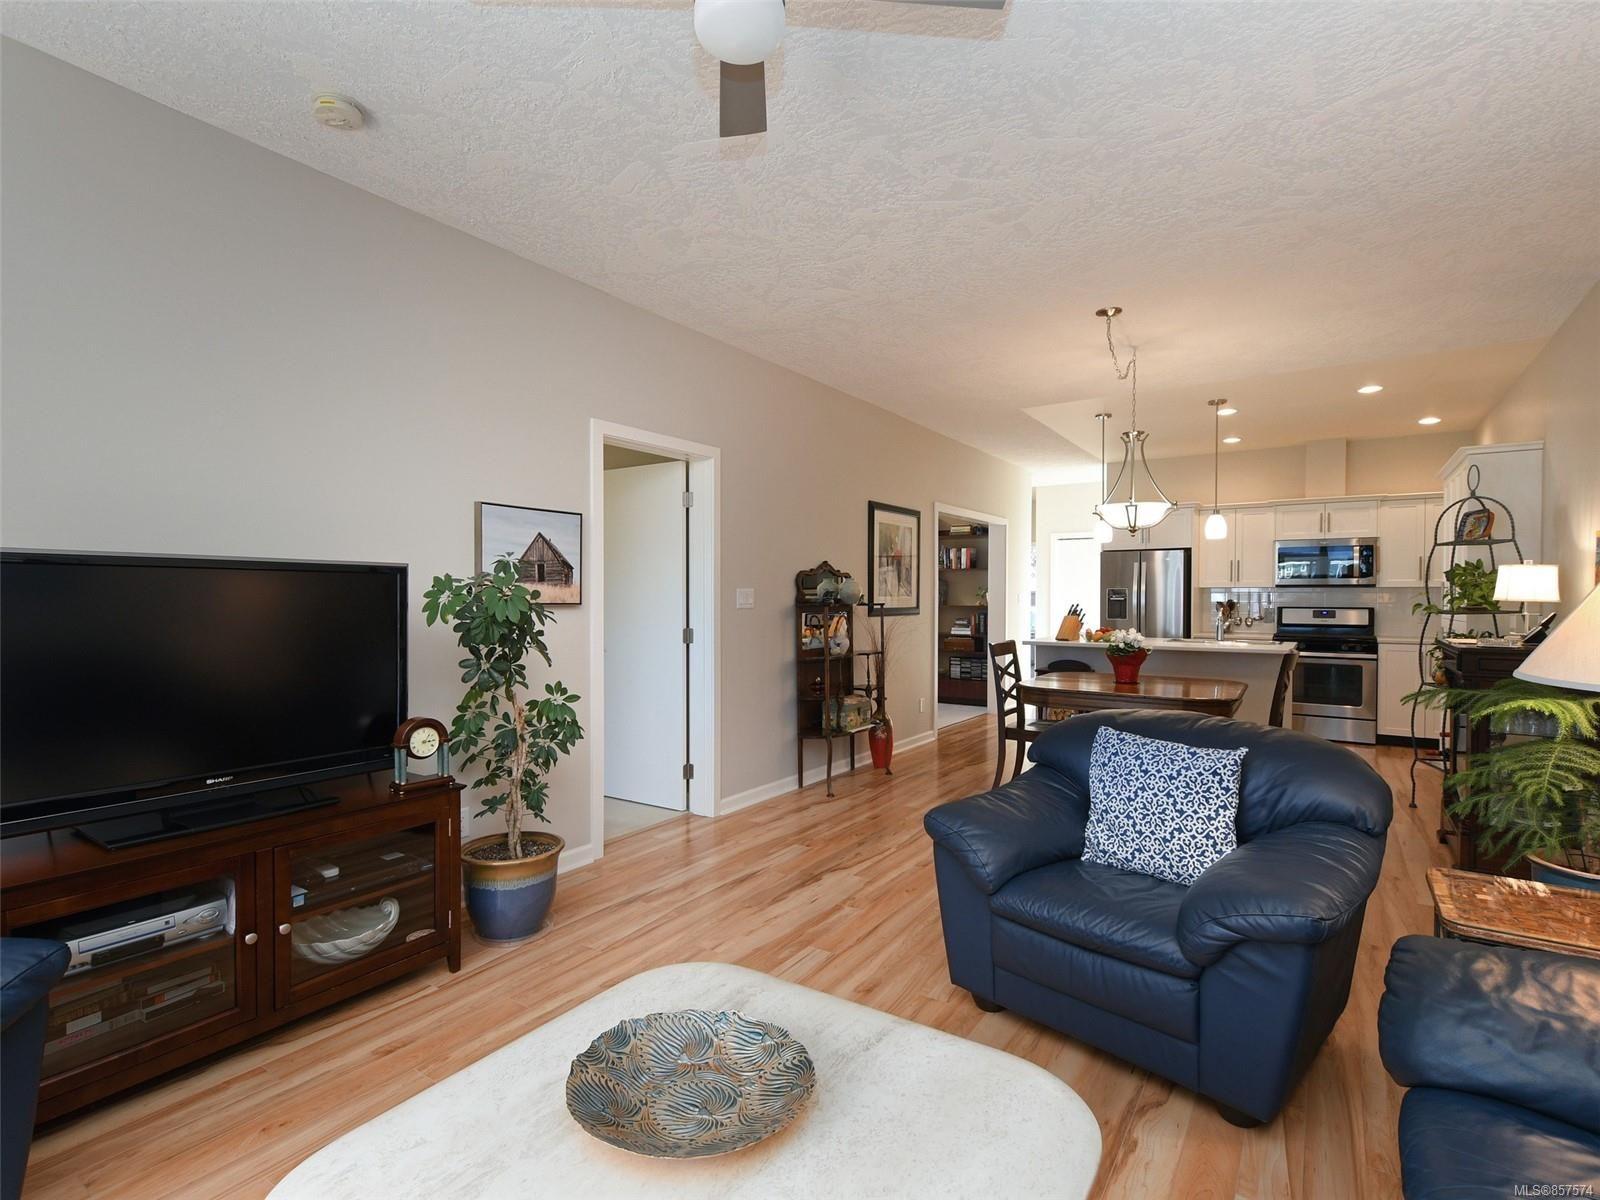 Photo 3: Photos: 6376 Shambrook Dr in : Sk Sunriver House for sale (Sooke)  : MLS®# 857574